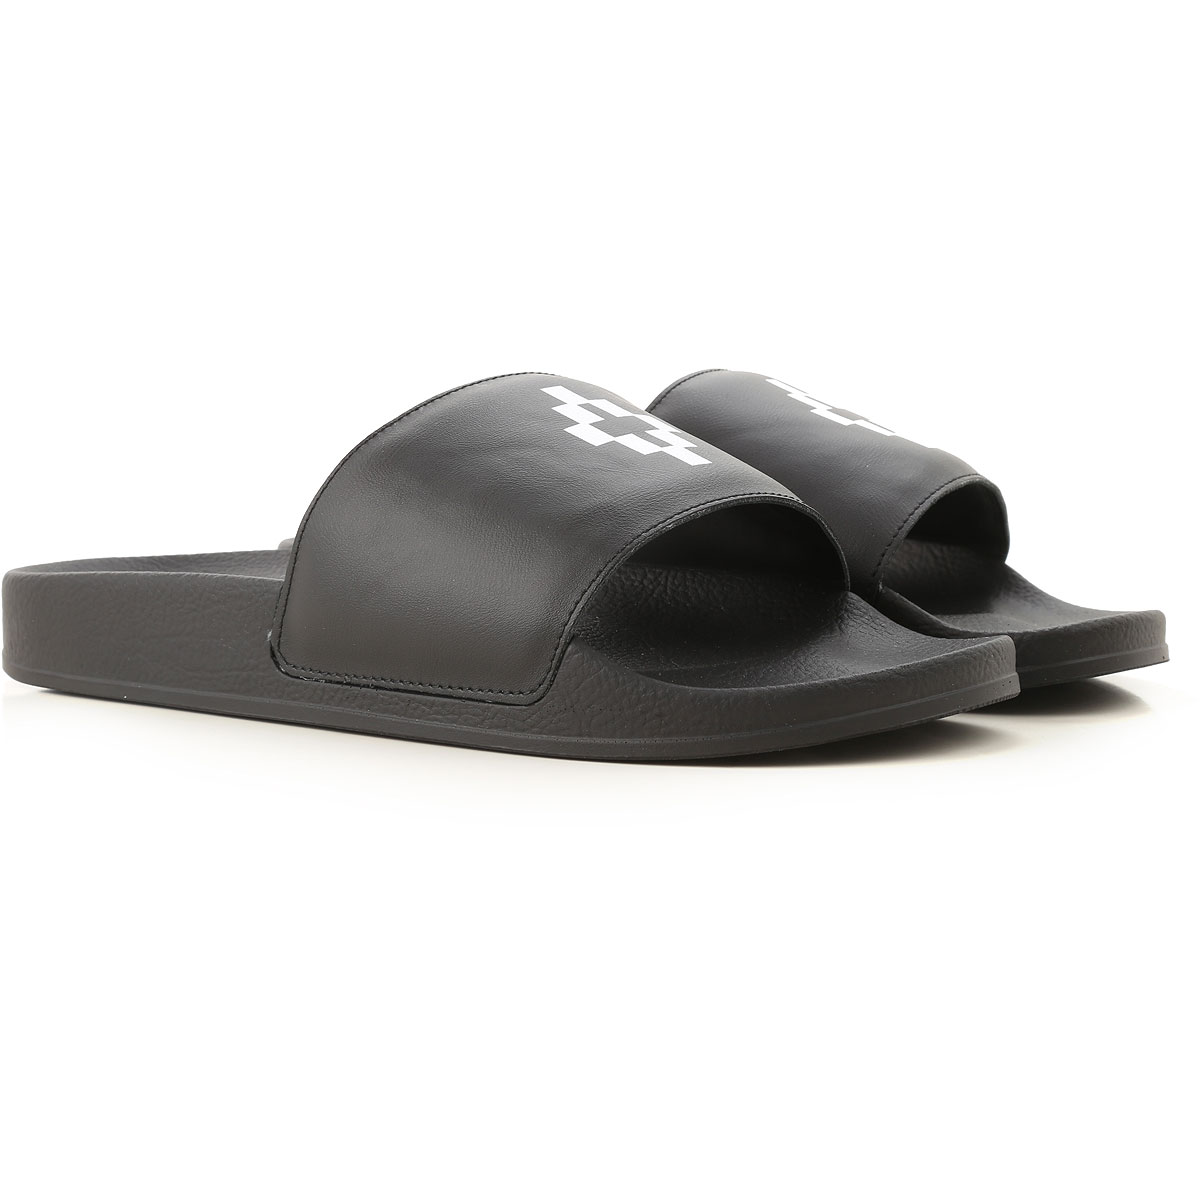 Image of Marcelo Burlon Flip Flops for Men, Black, Leather, 2017, 10 10.5 8 9